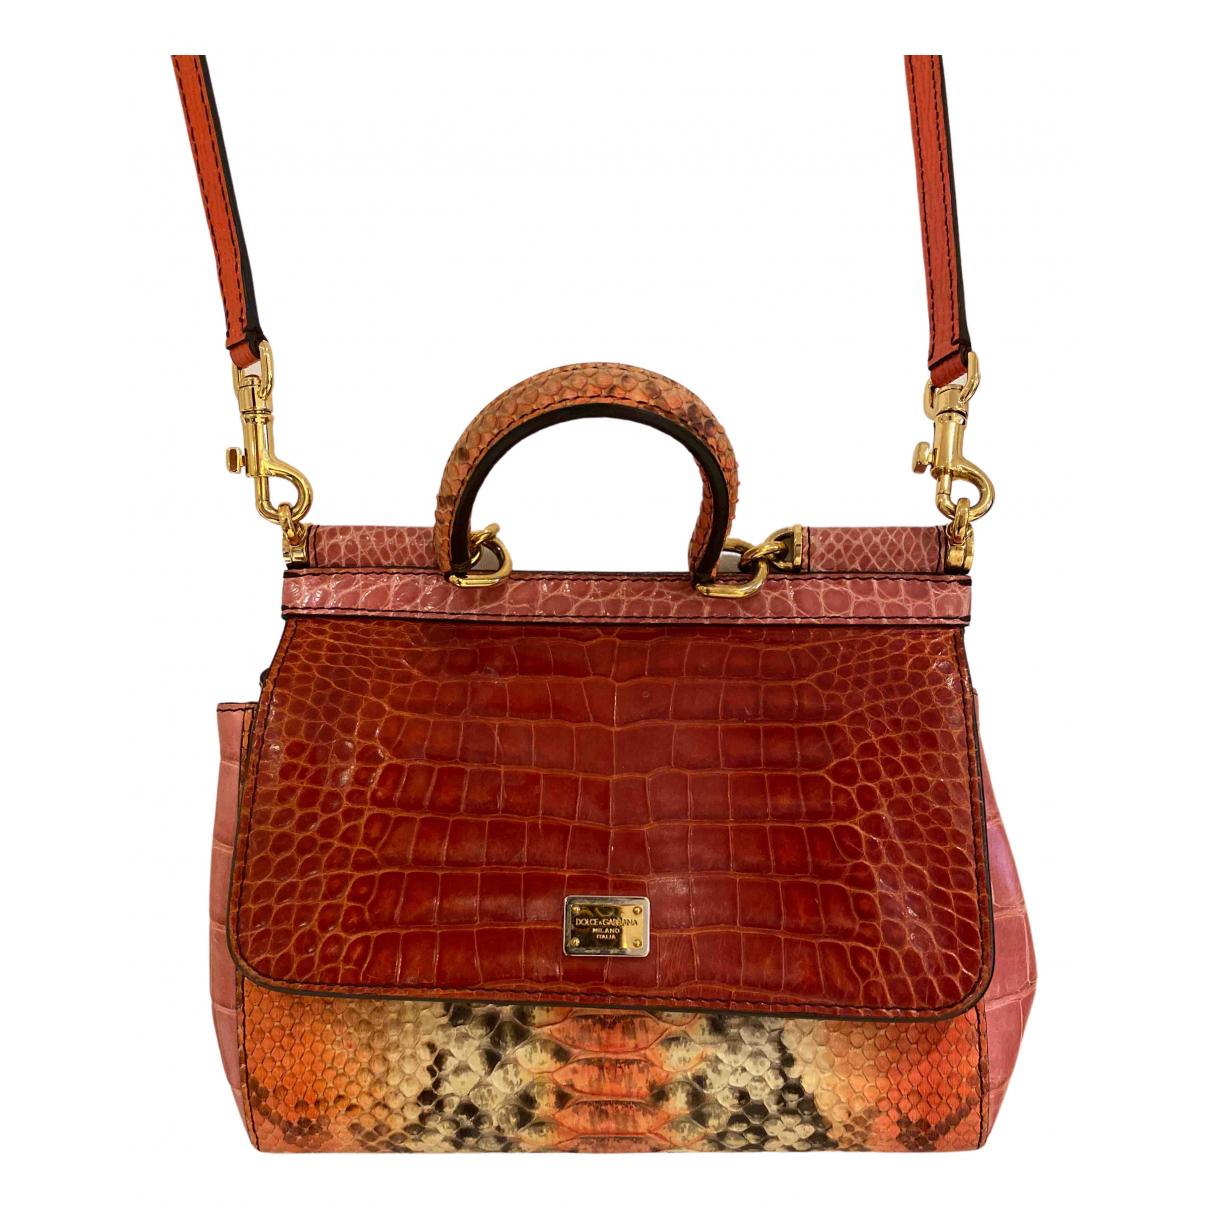 Dolce & Gabbana - Sac a main Sicily pour femme en crocodile - orange